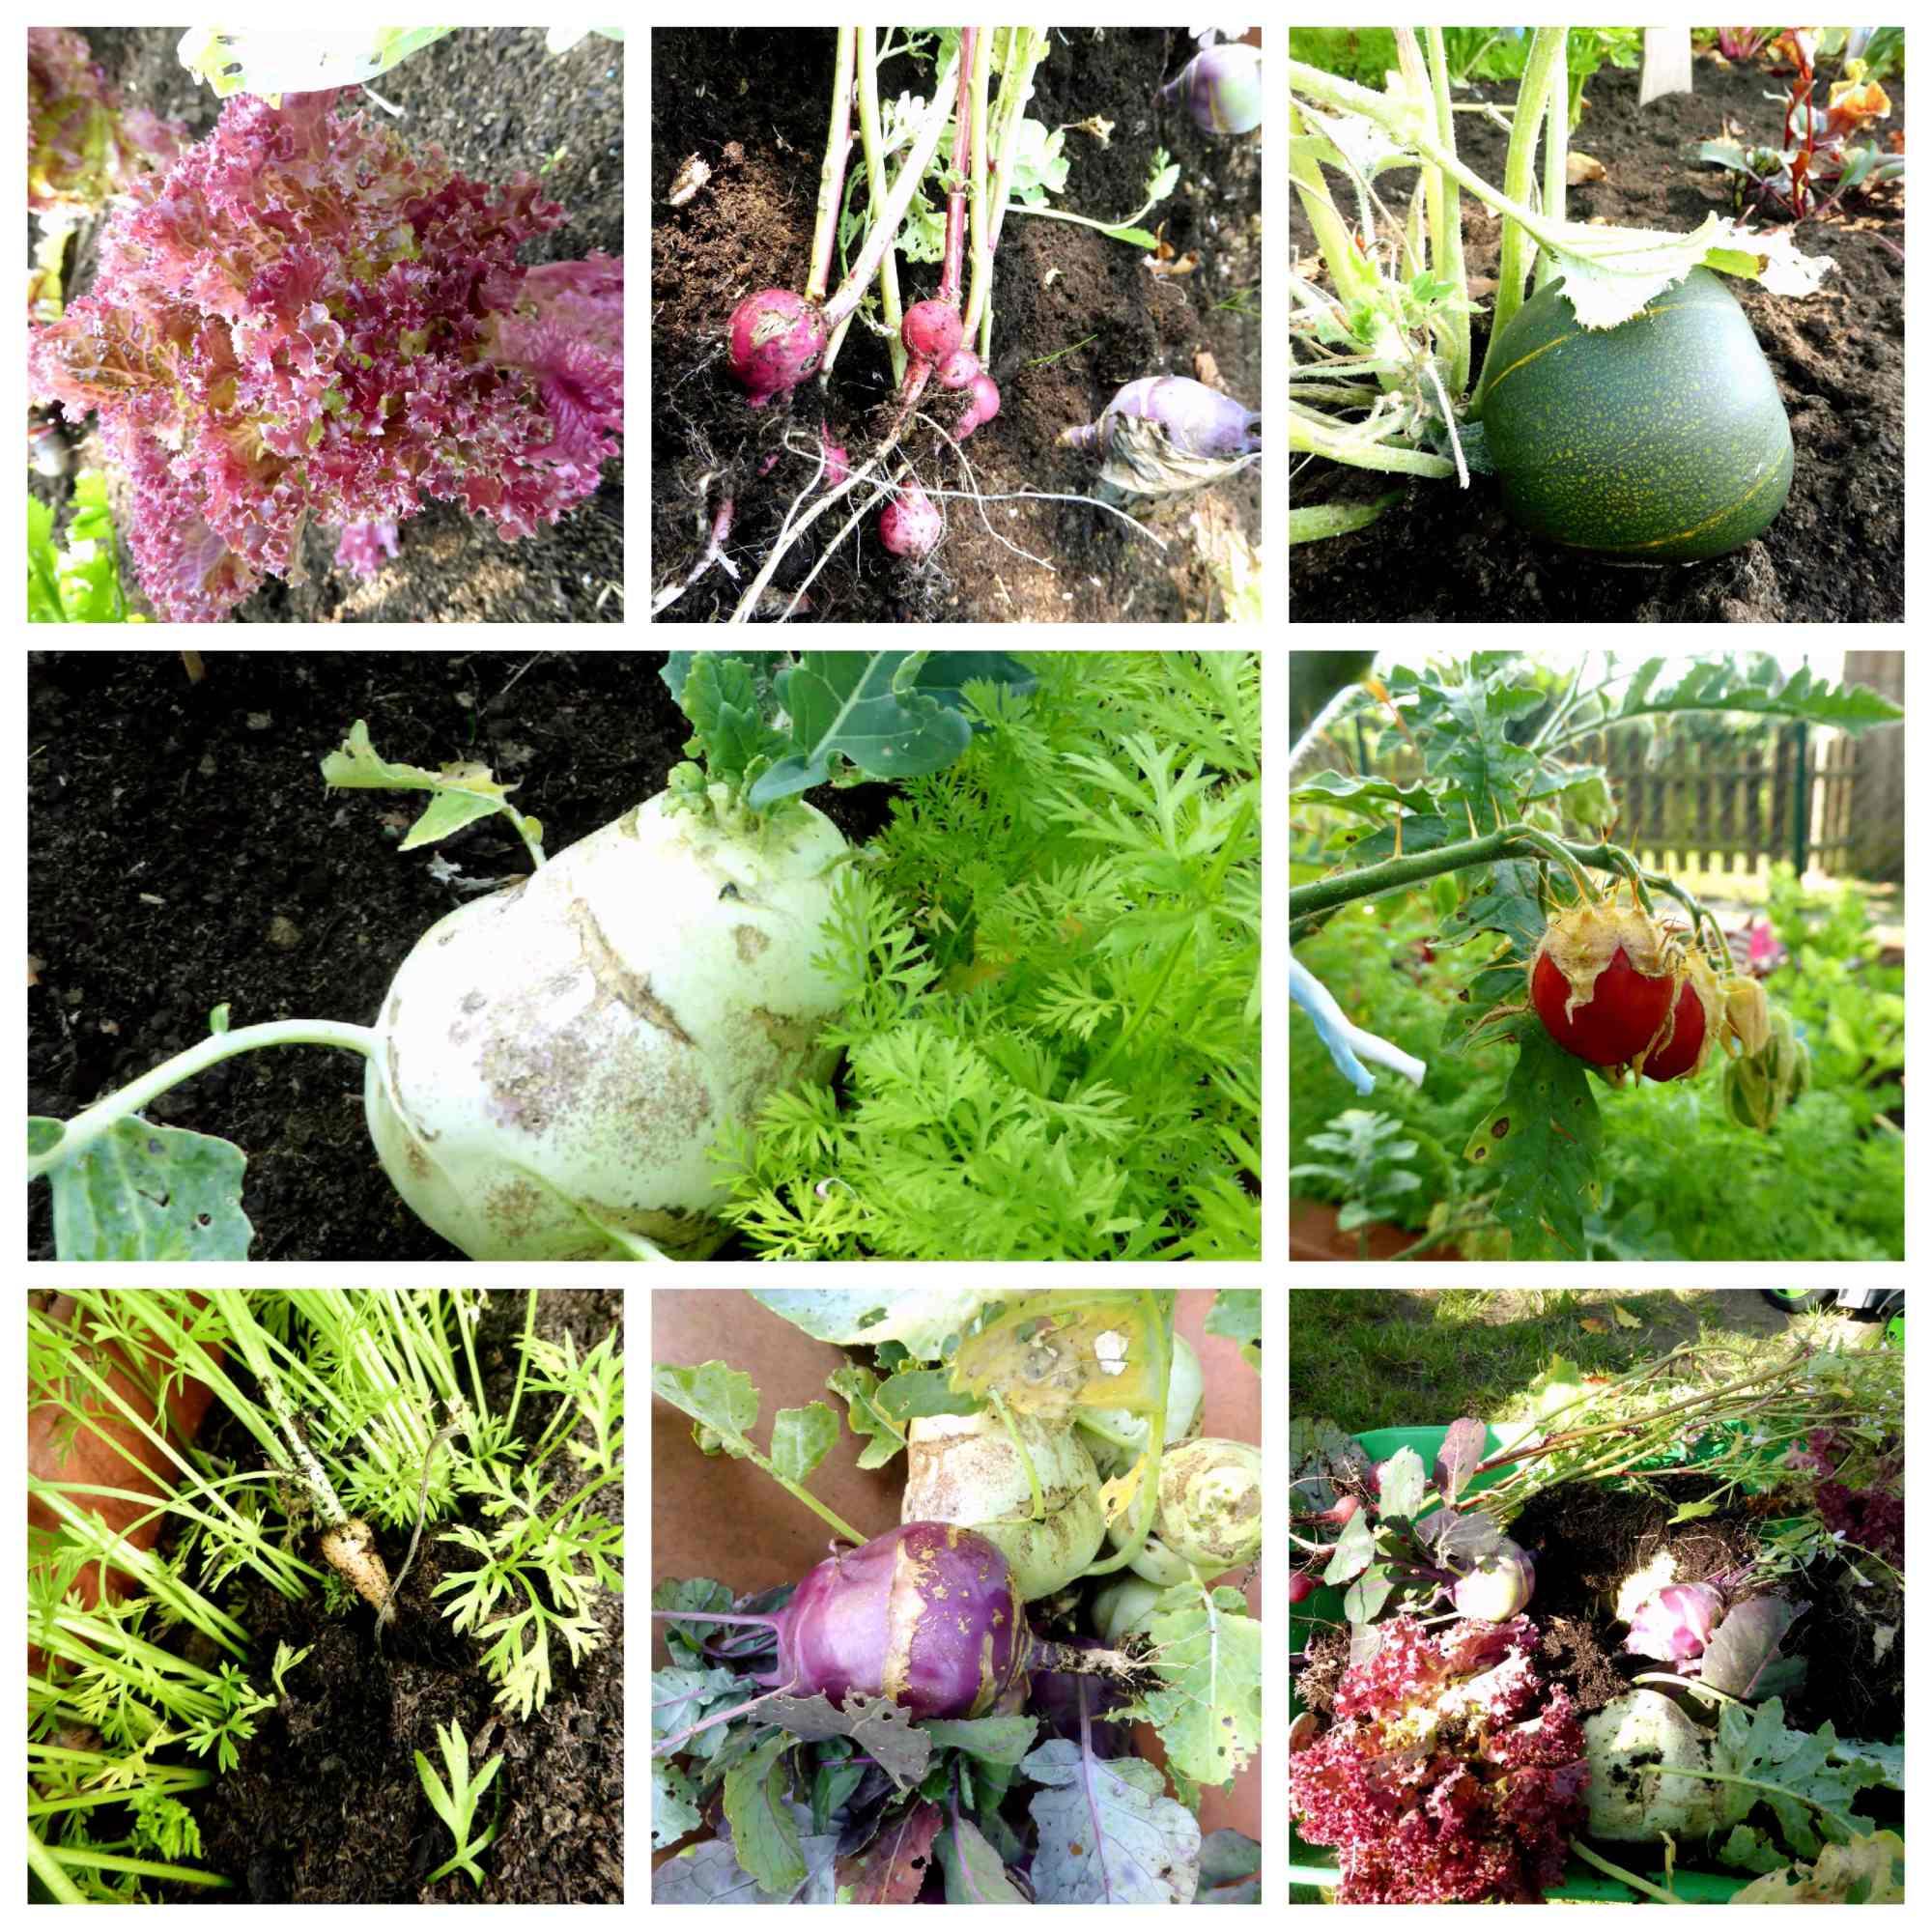 Kita Jersbek Gemüsebeet Aktion 2019 - Gemüsebeet für Kinder